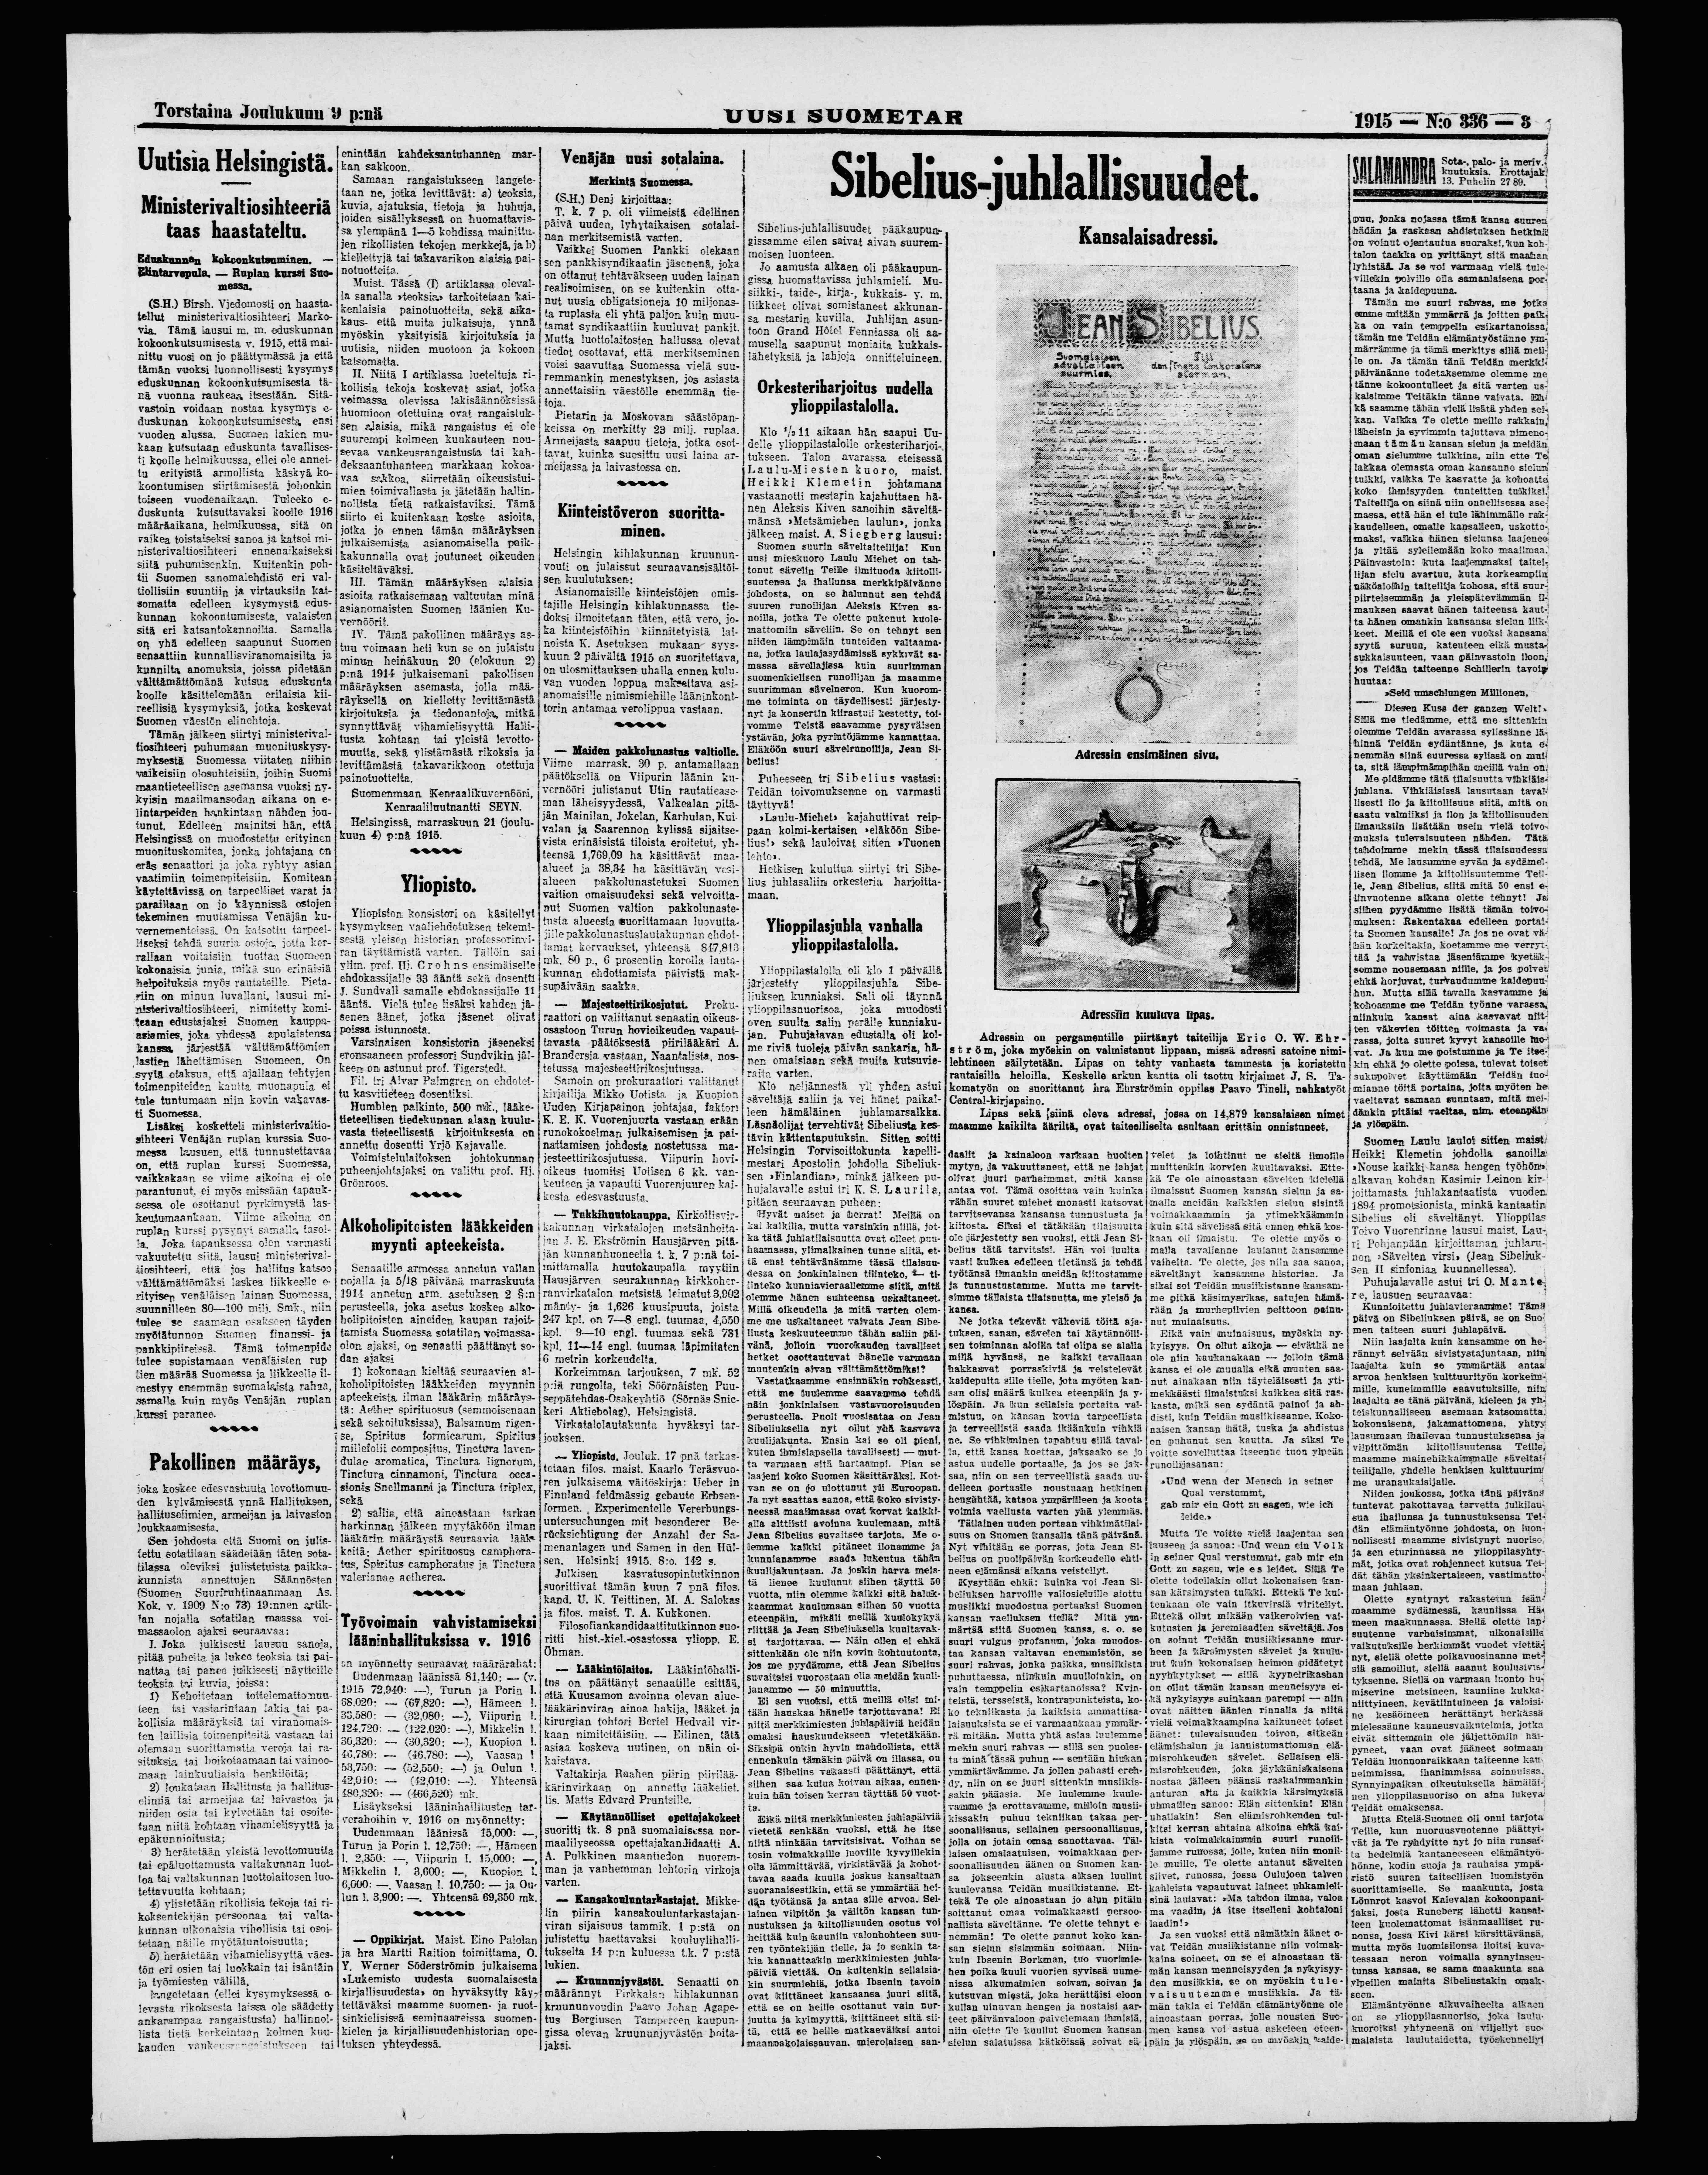 Uusi Suometar 9.12.1915